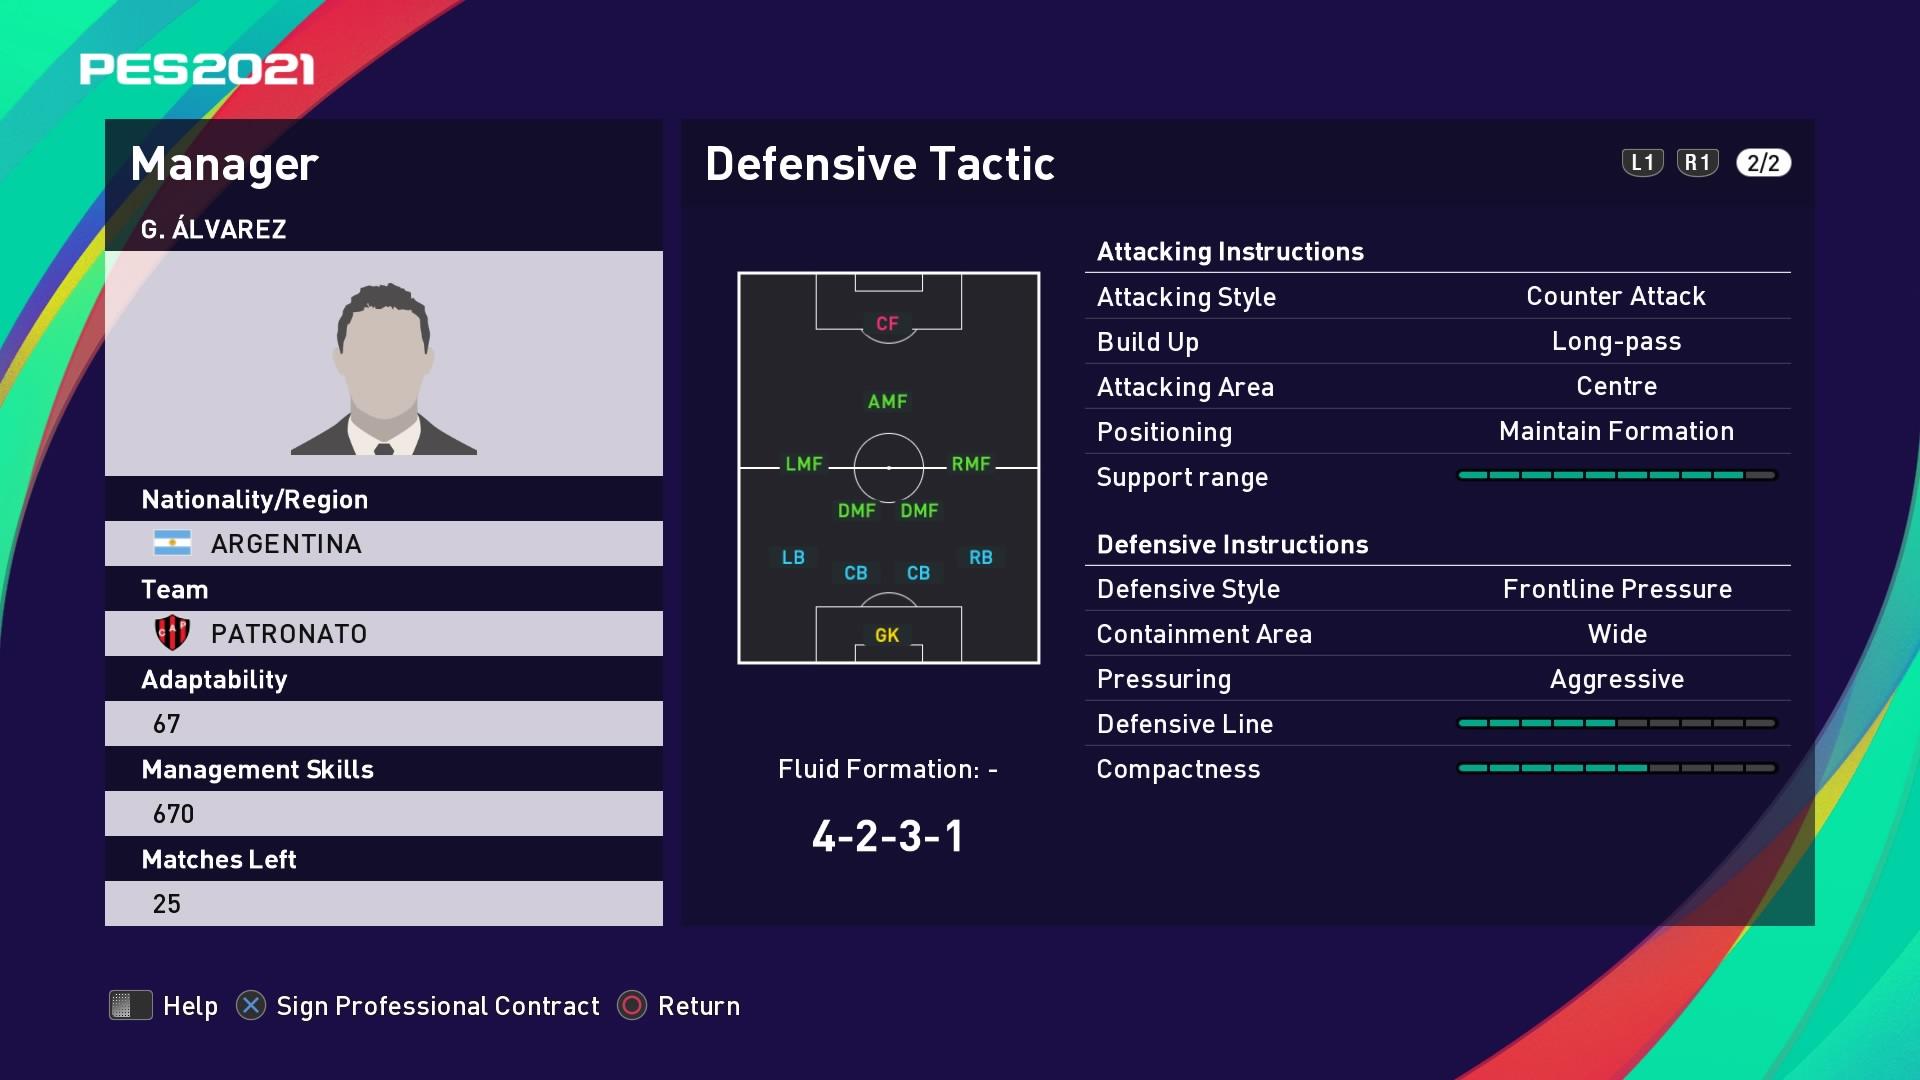 G. Álvarez (Mario Sciacqua) Defensive Tactic in PES 2021 myClub